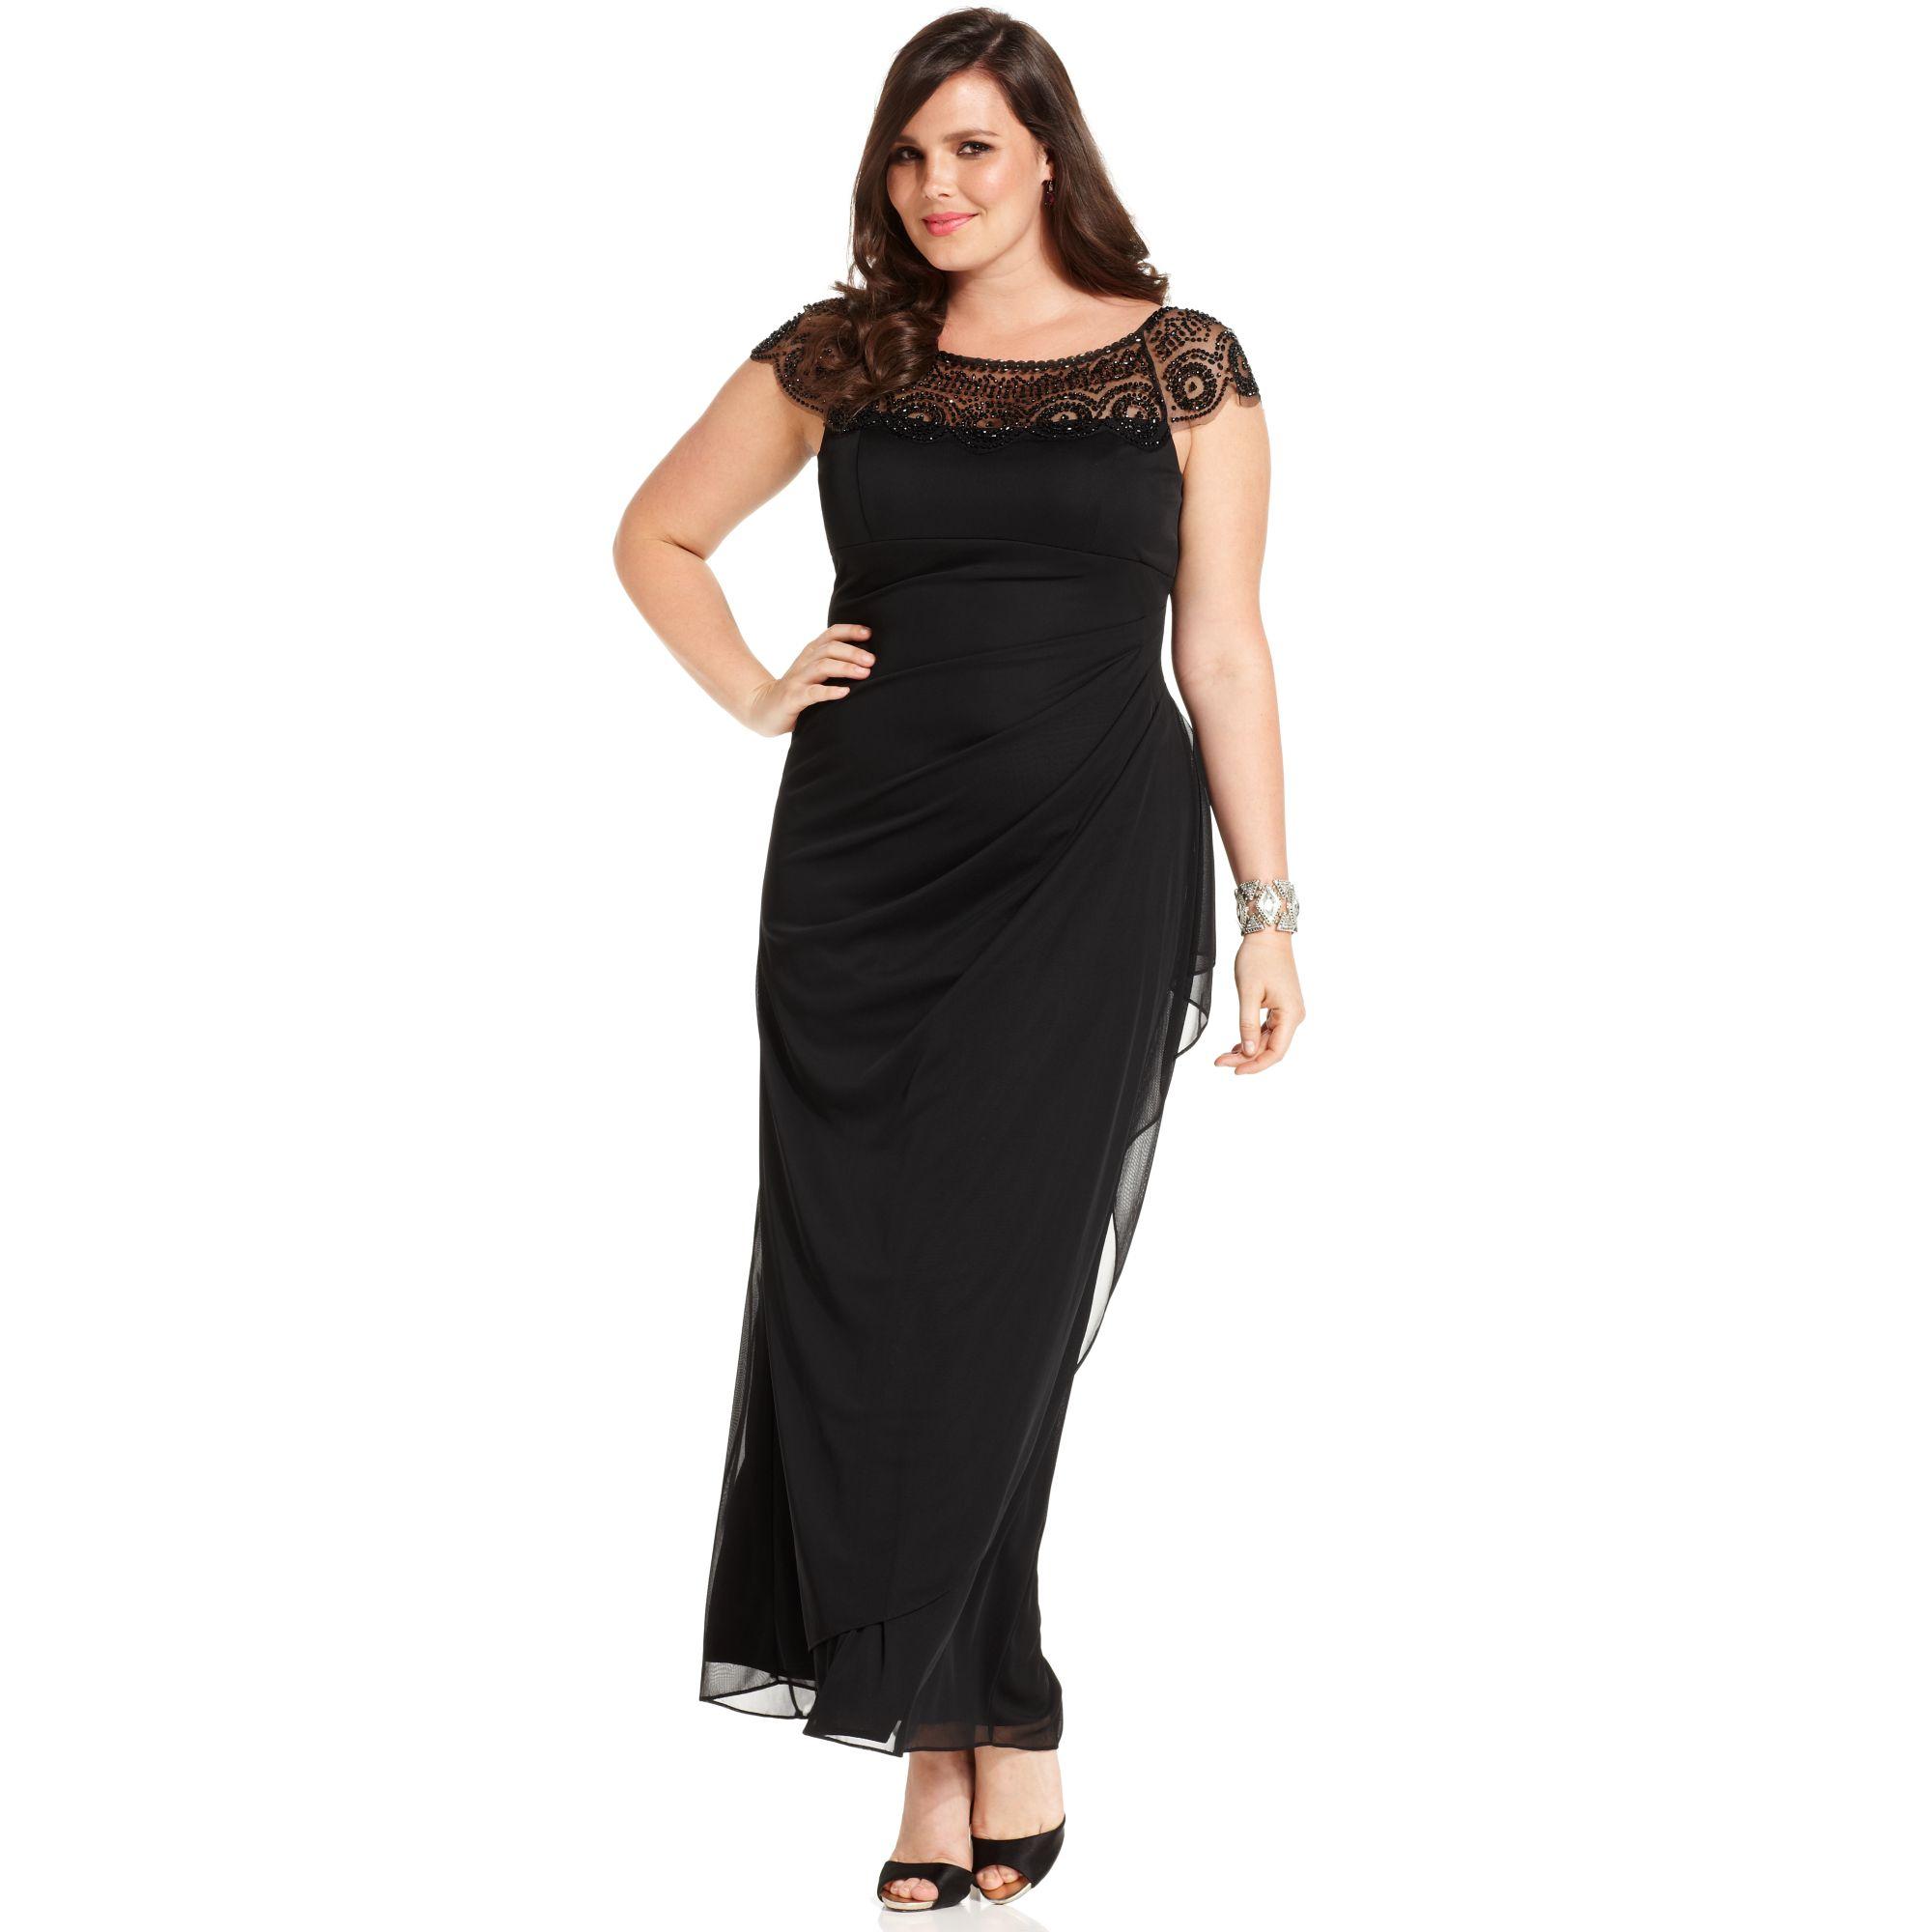 Xscape Xscape Plus Size Dress Cap Sleeve Beaded Draped in Black | Lyst